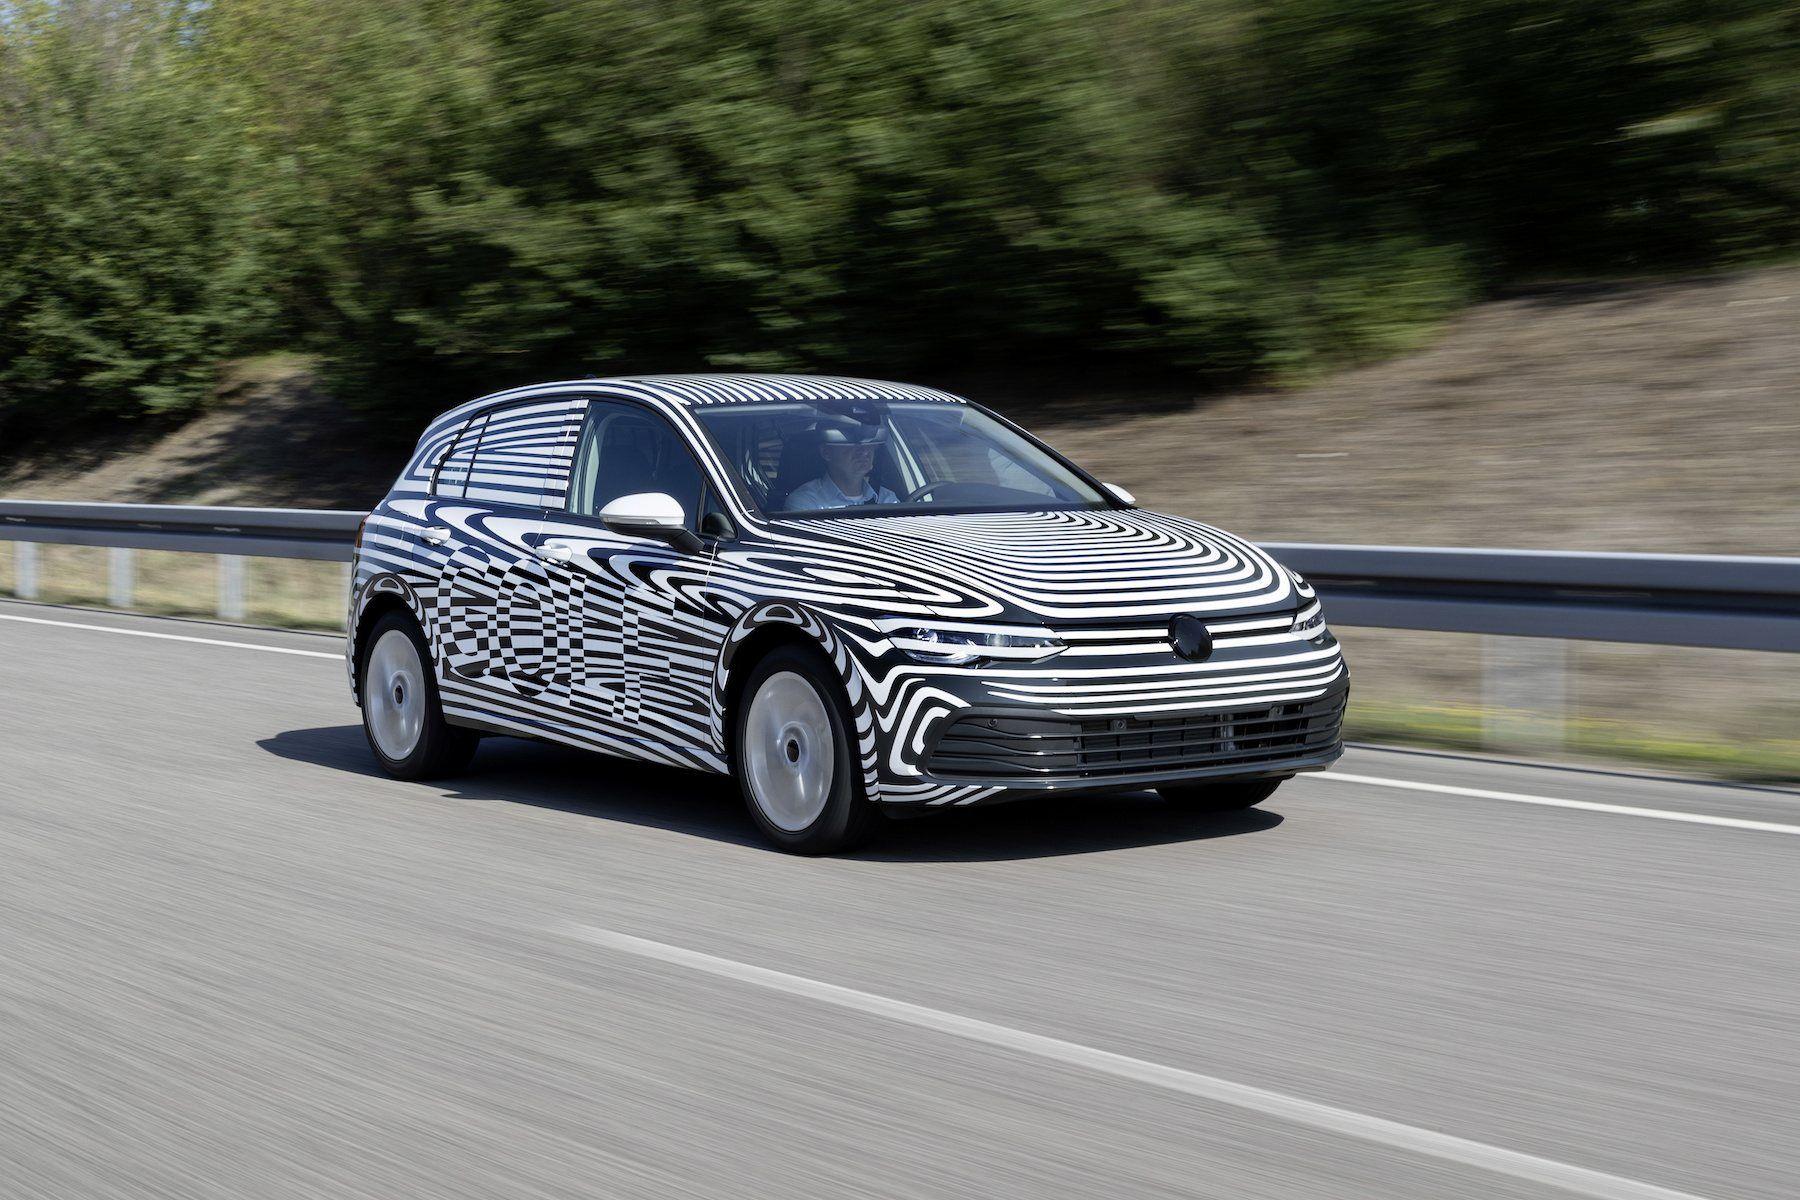 2021 Vw Jetta Tdi Gli Pictures In 2020 Volkswagen Golf Volkswagen Vw Jetta